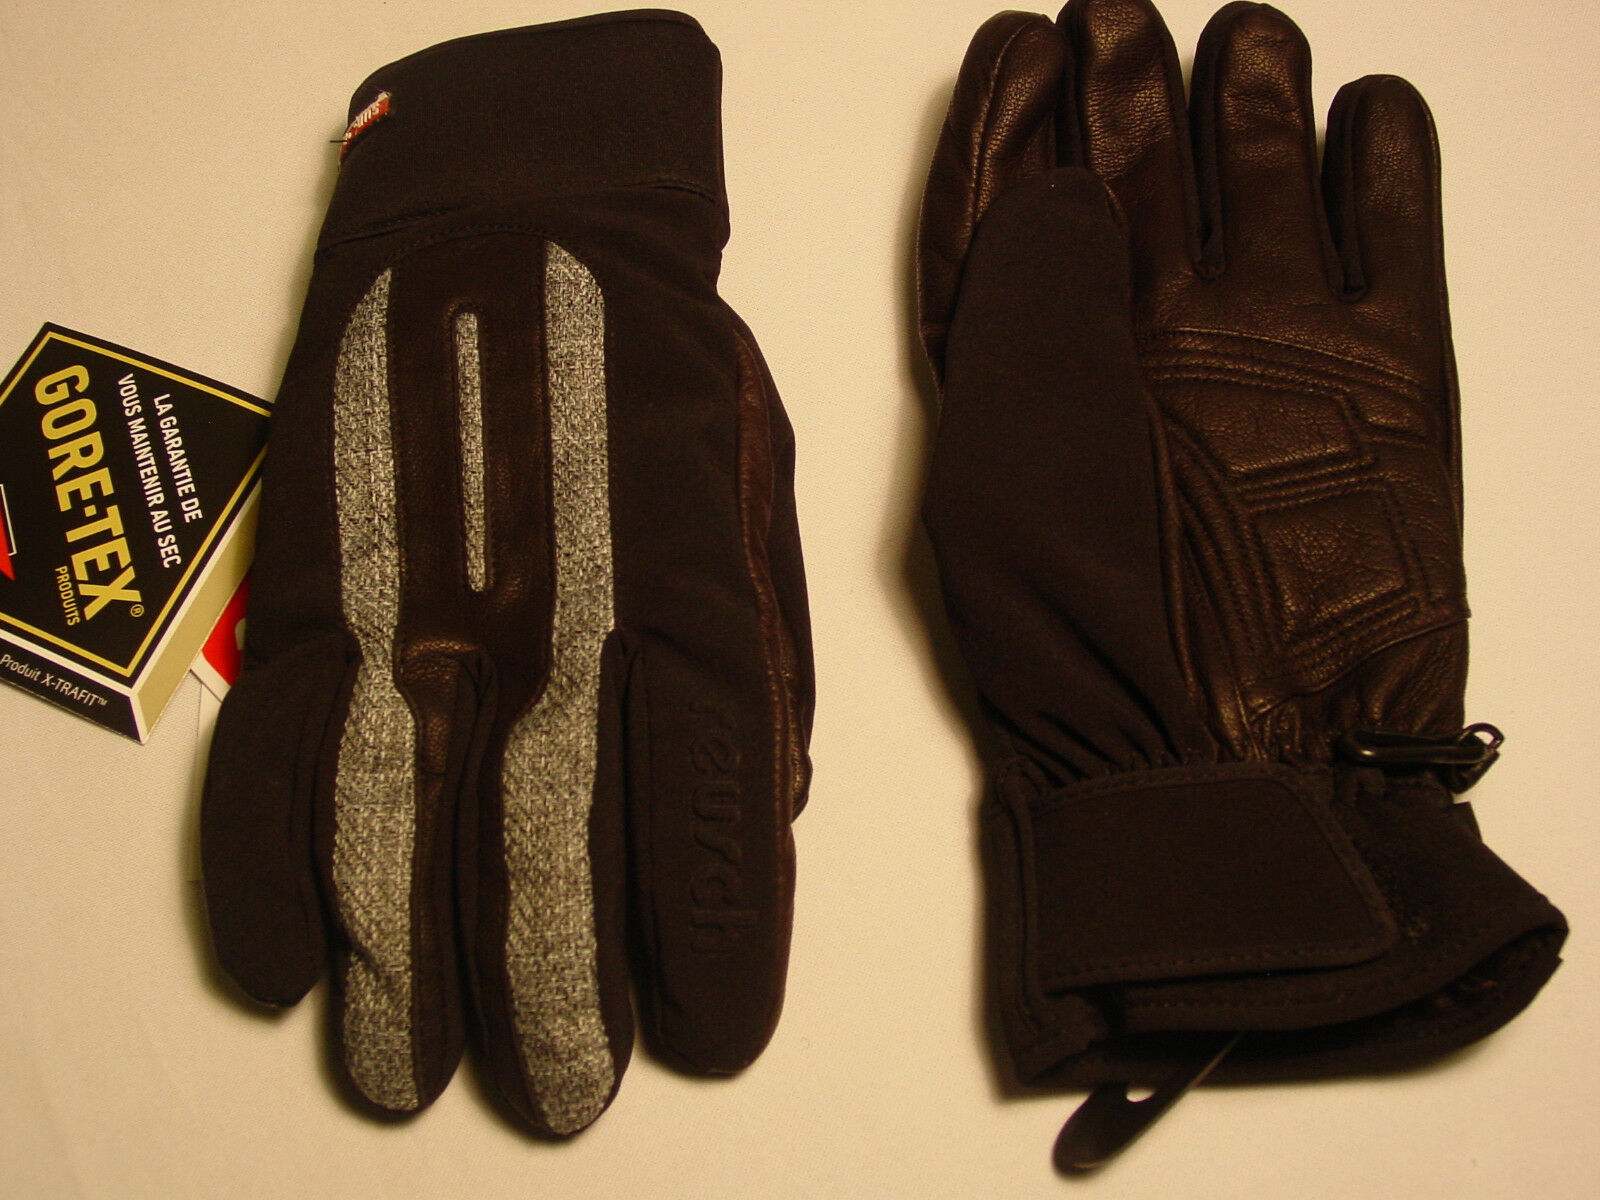 New Reusch Ski GoreTex  Leather & Softshell G s  Medium (8.5) Arco  lightning delivery